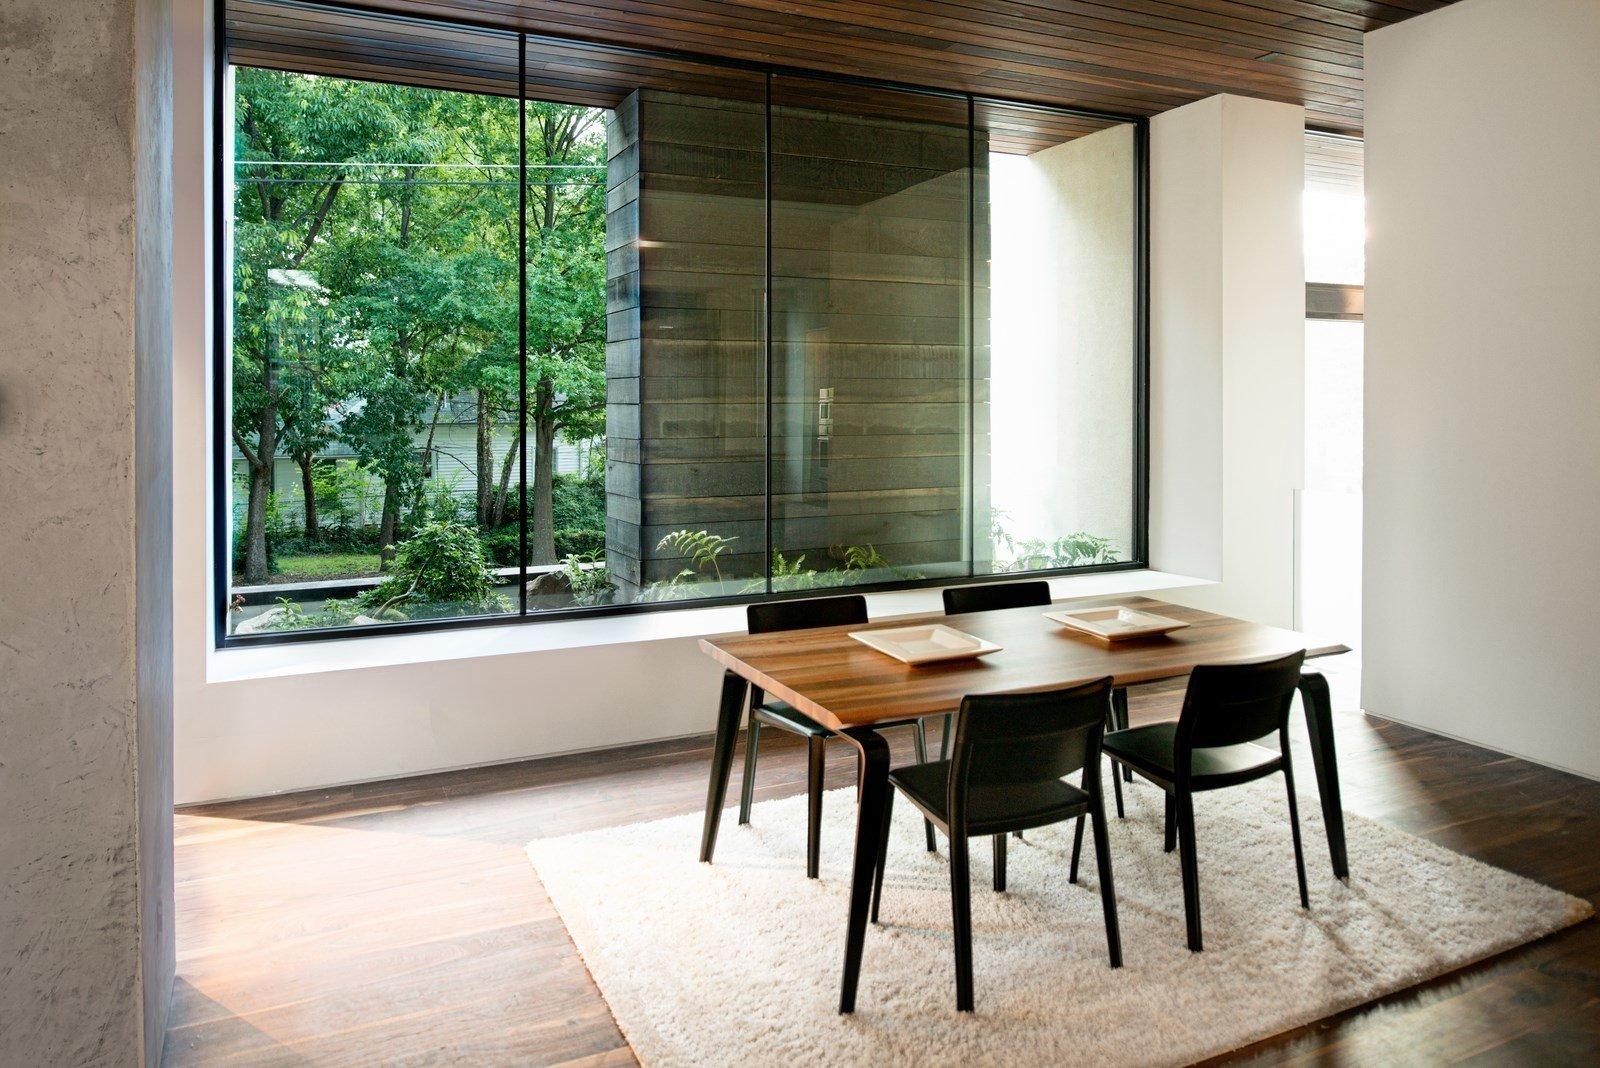 Dining Room, Medium Hardwood Floor, Table, and Chair  Alaska House